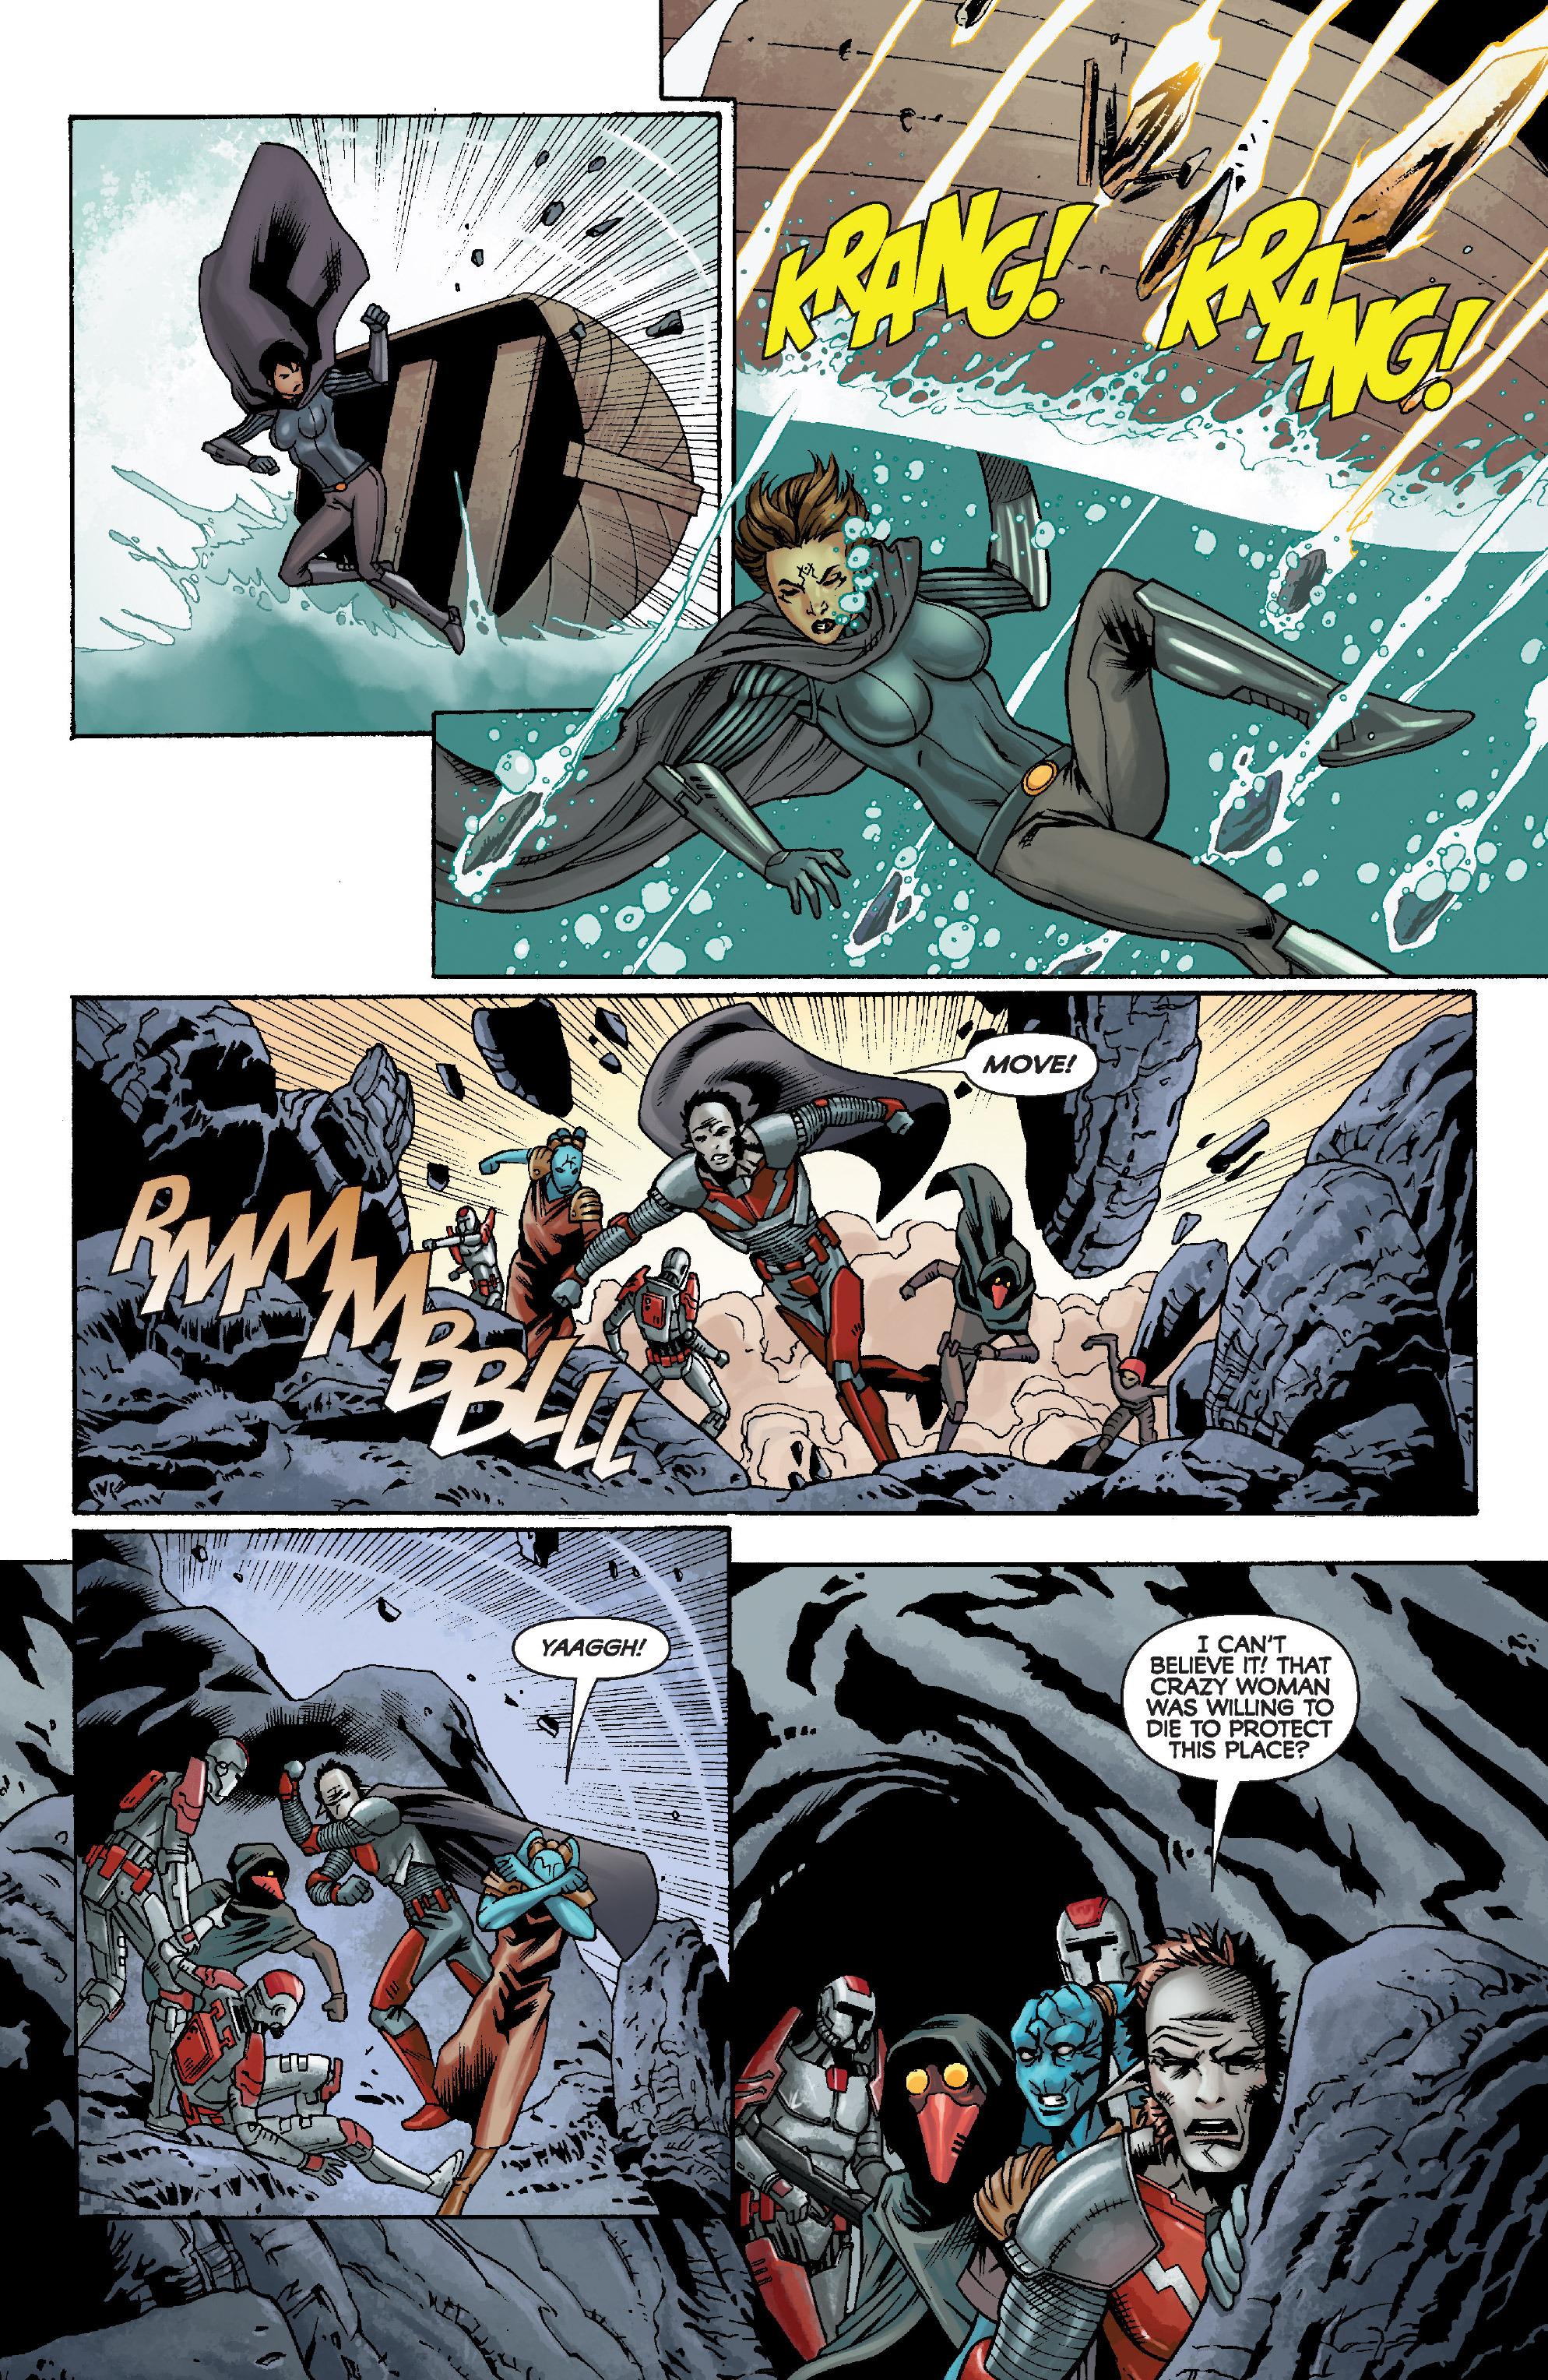 Read online Star Wars: Knight Errant - Escape comic -  Issue #2 - 22